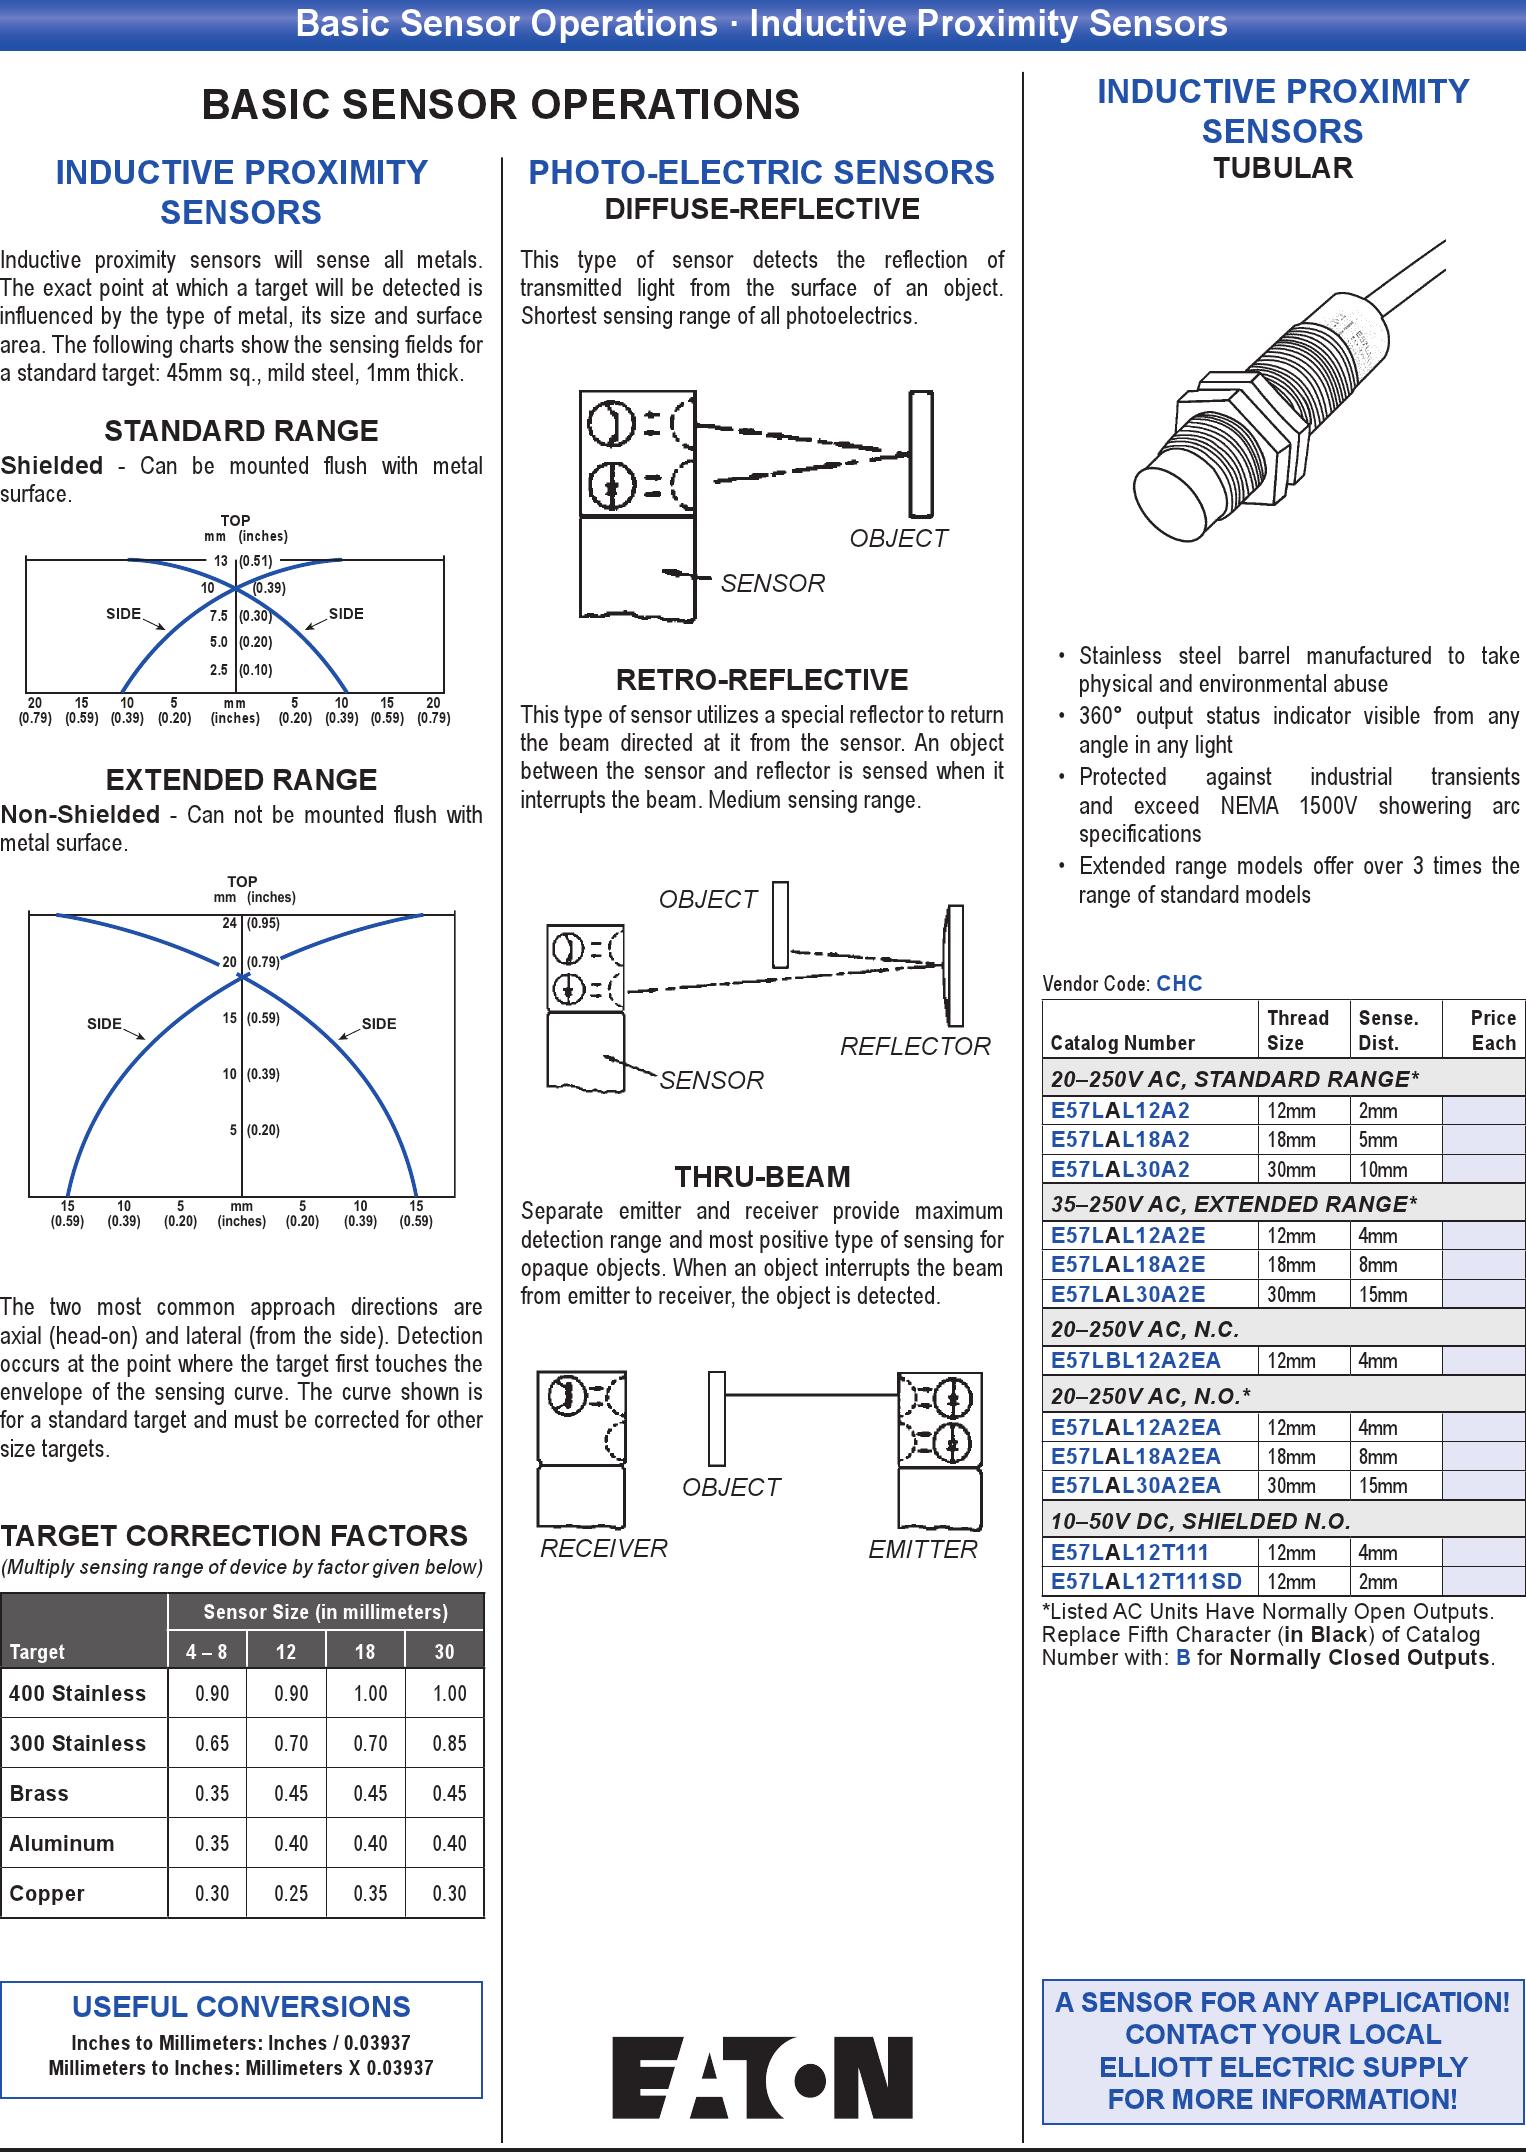 Basic Sensor Operations Inductive Proximity Sensors Print Add Item To Cart